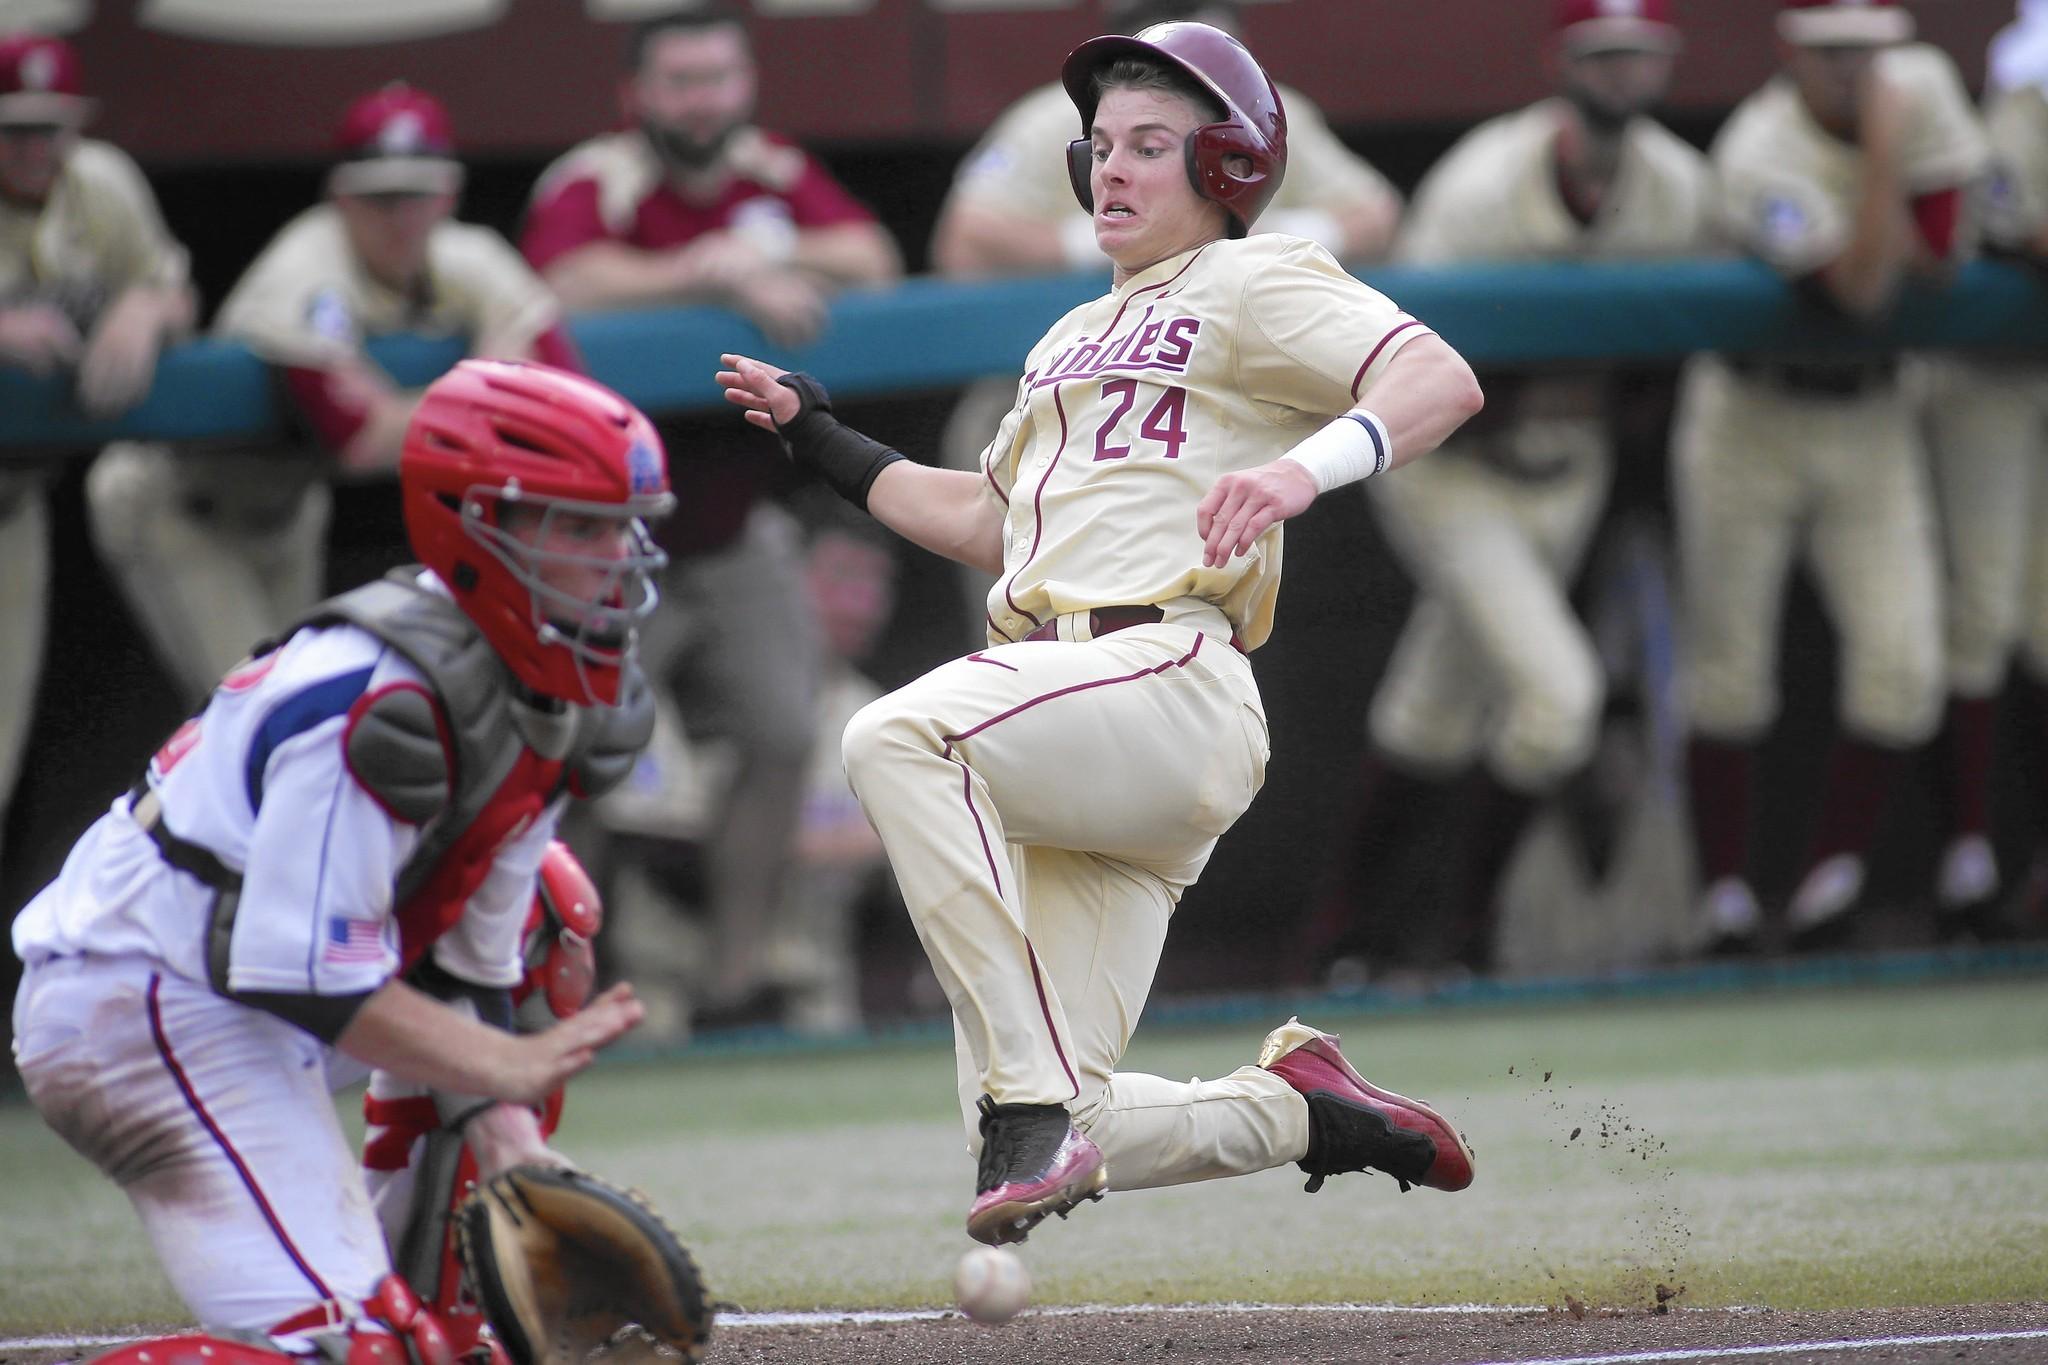 Os-florida-state-baseball-regional-0606-20160605